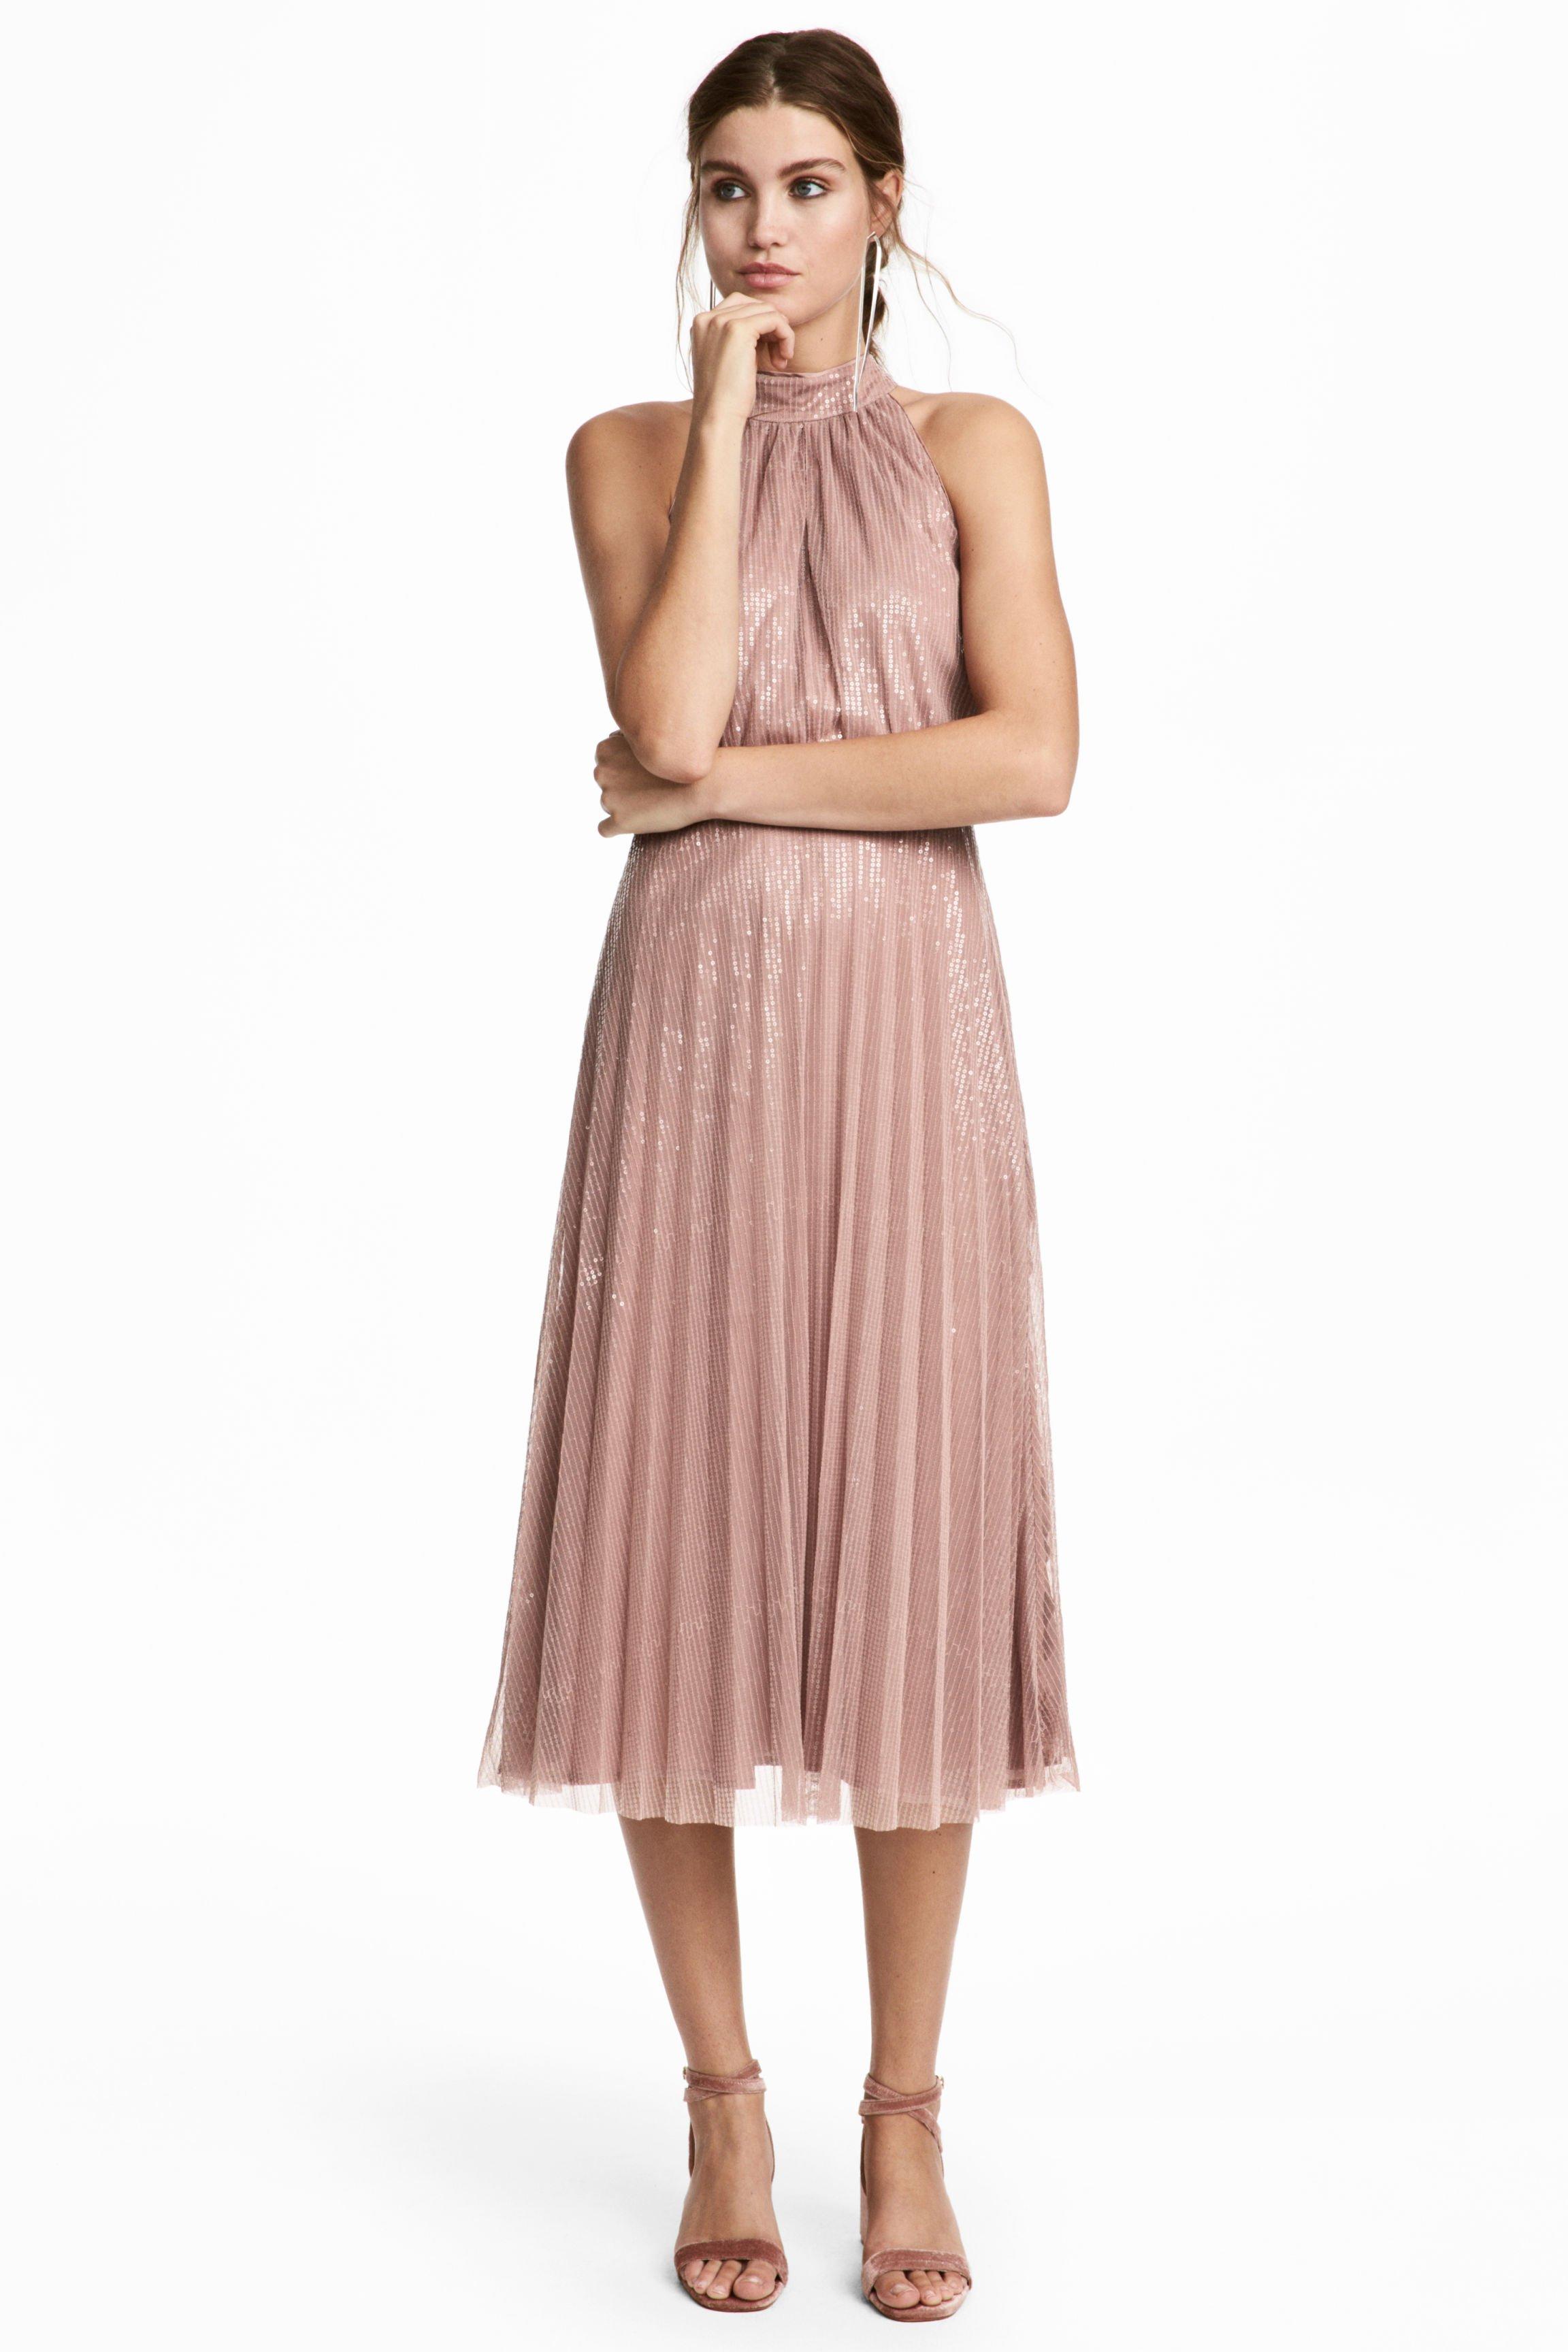 h m sequined dark powder pink dress we select dresses